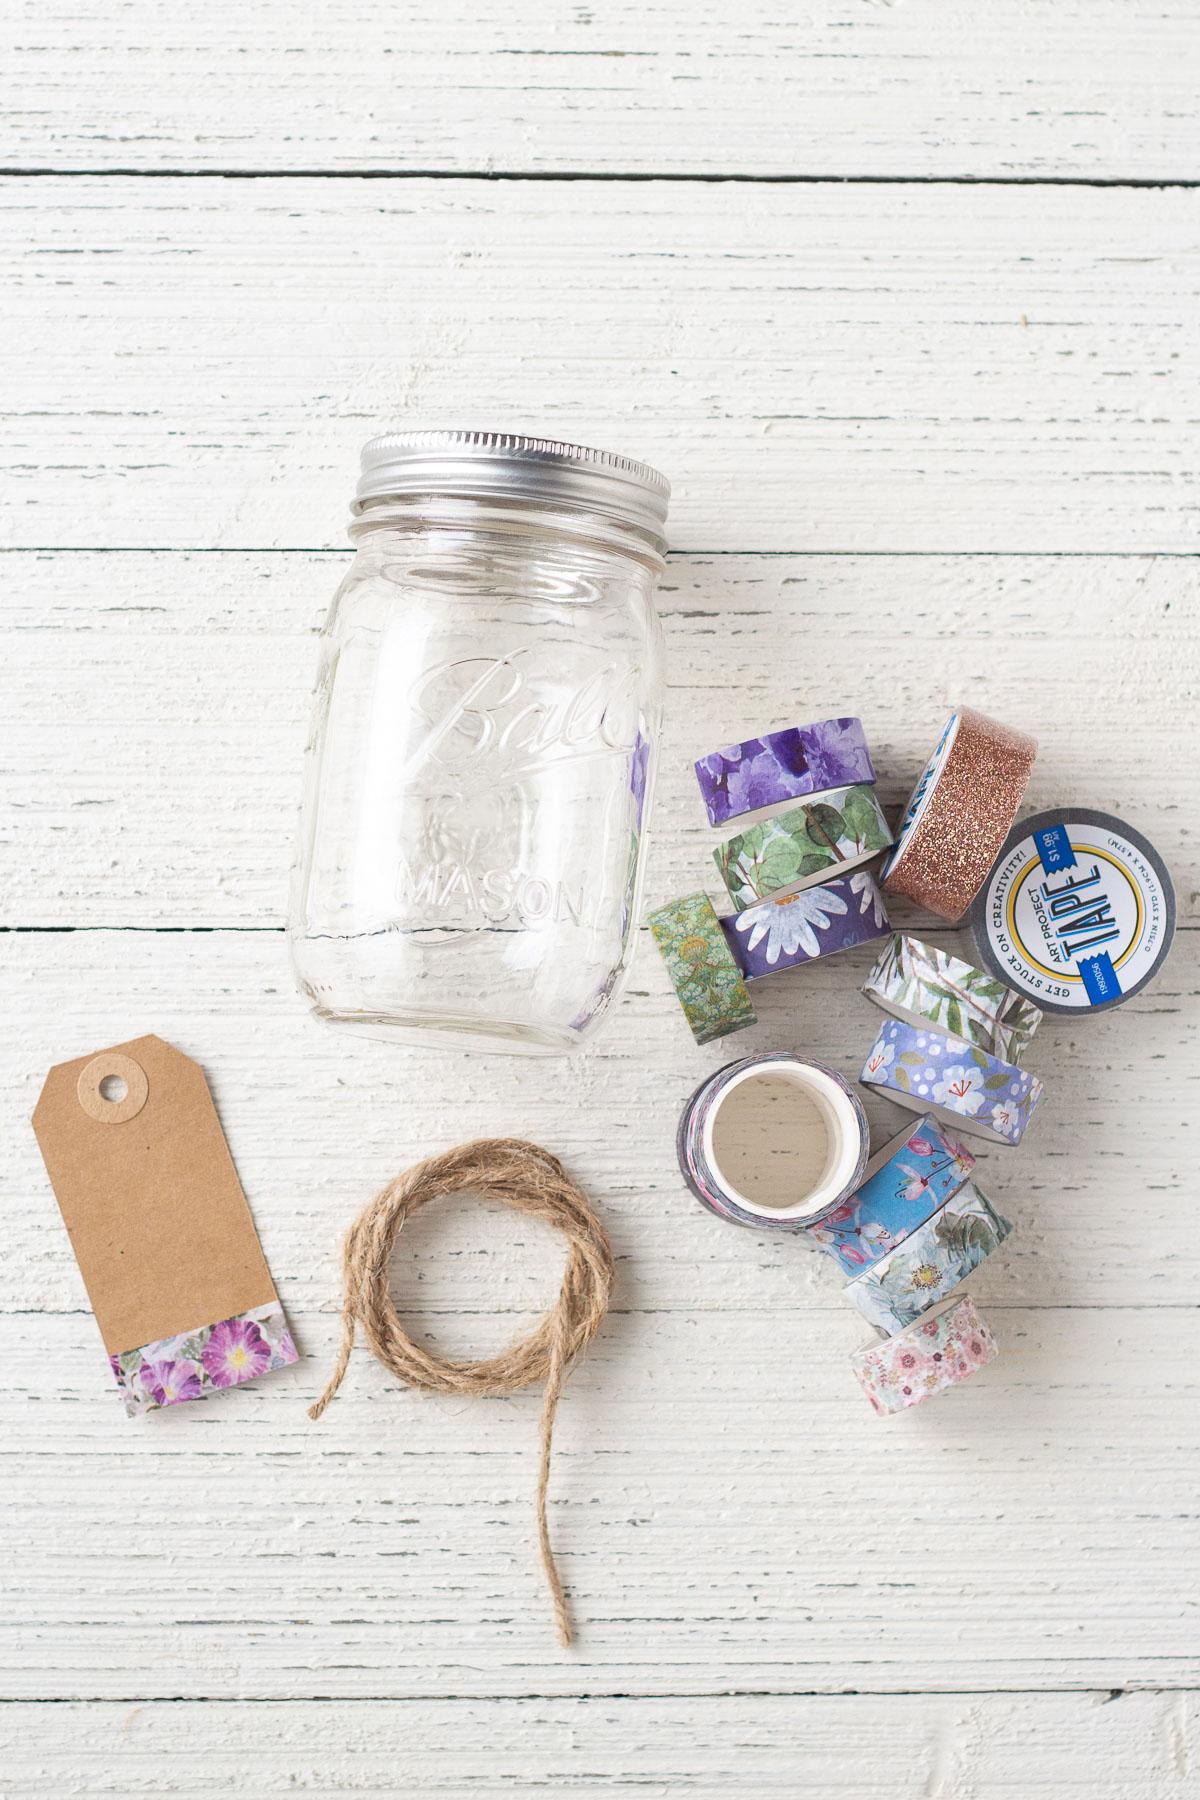 A mason jar, gift tag, twine, and washi tape.